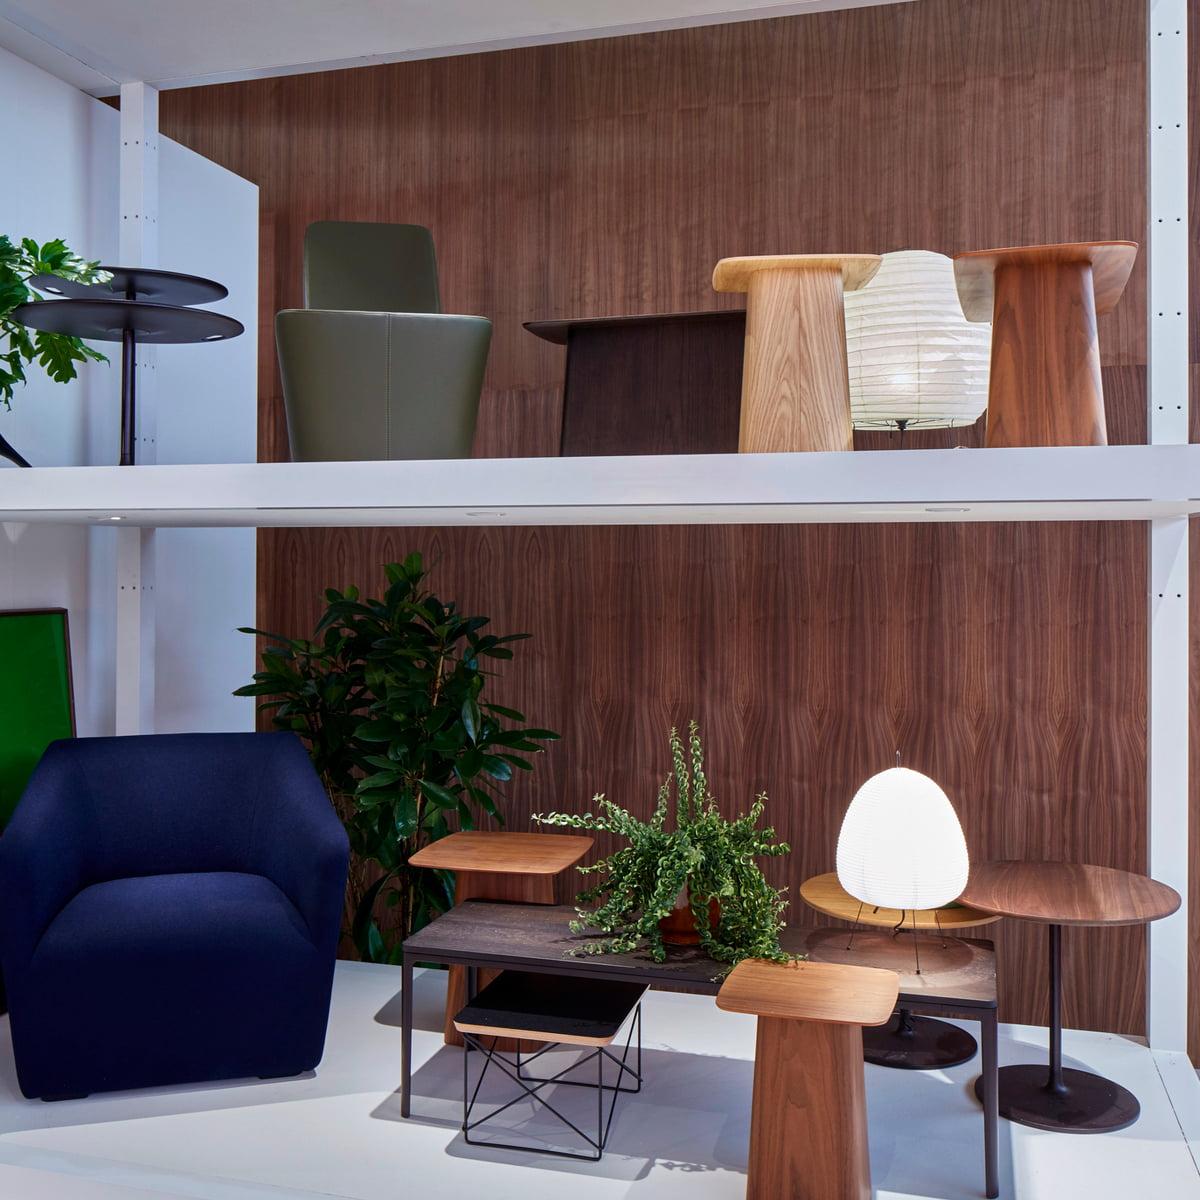 Wooden side tables par vitra for Salone del mobile vitra